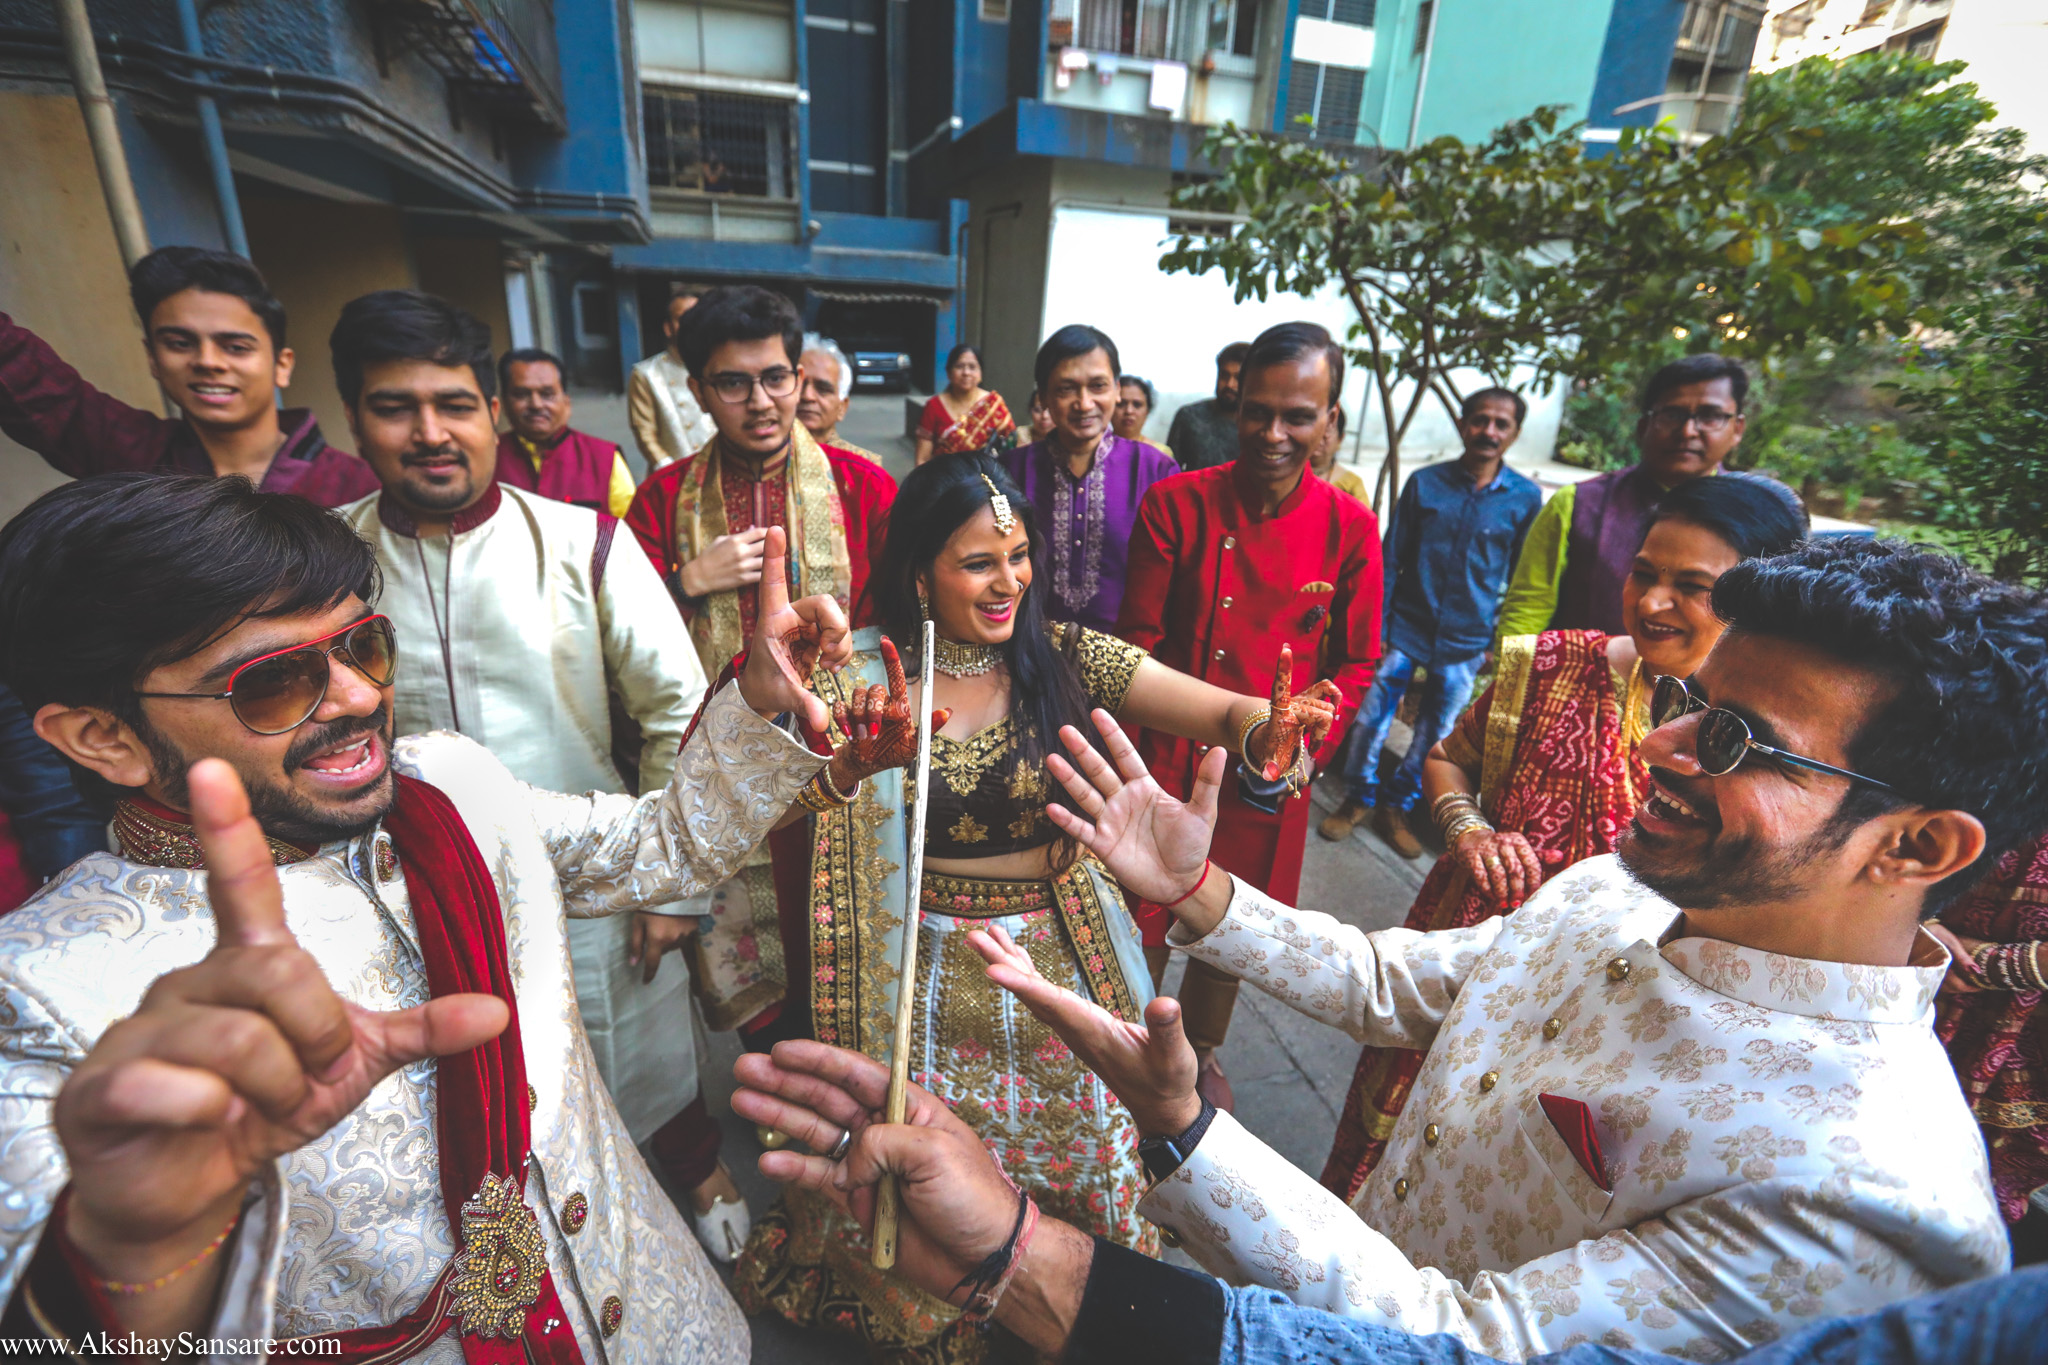 Akshay Sansare Photography Kunal x Shrutika best candid photographers in mumbai(26).jpg